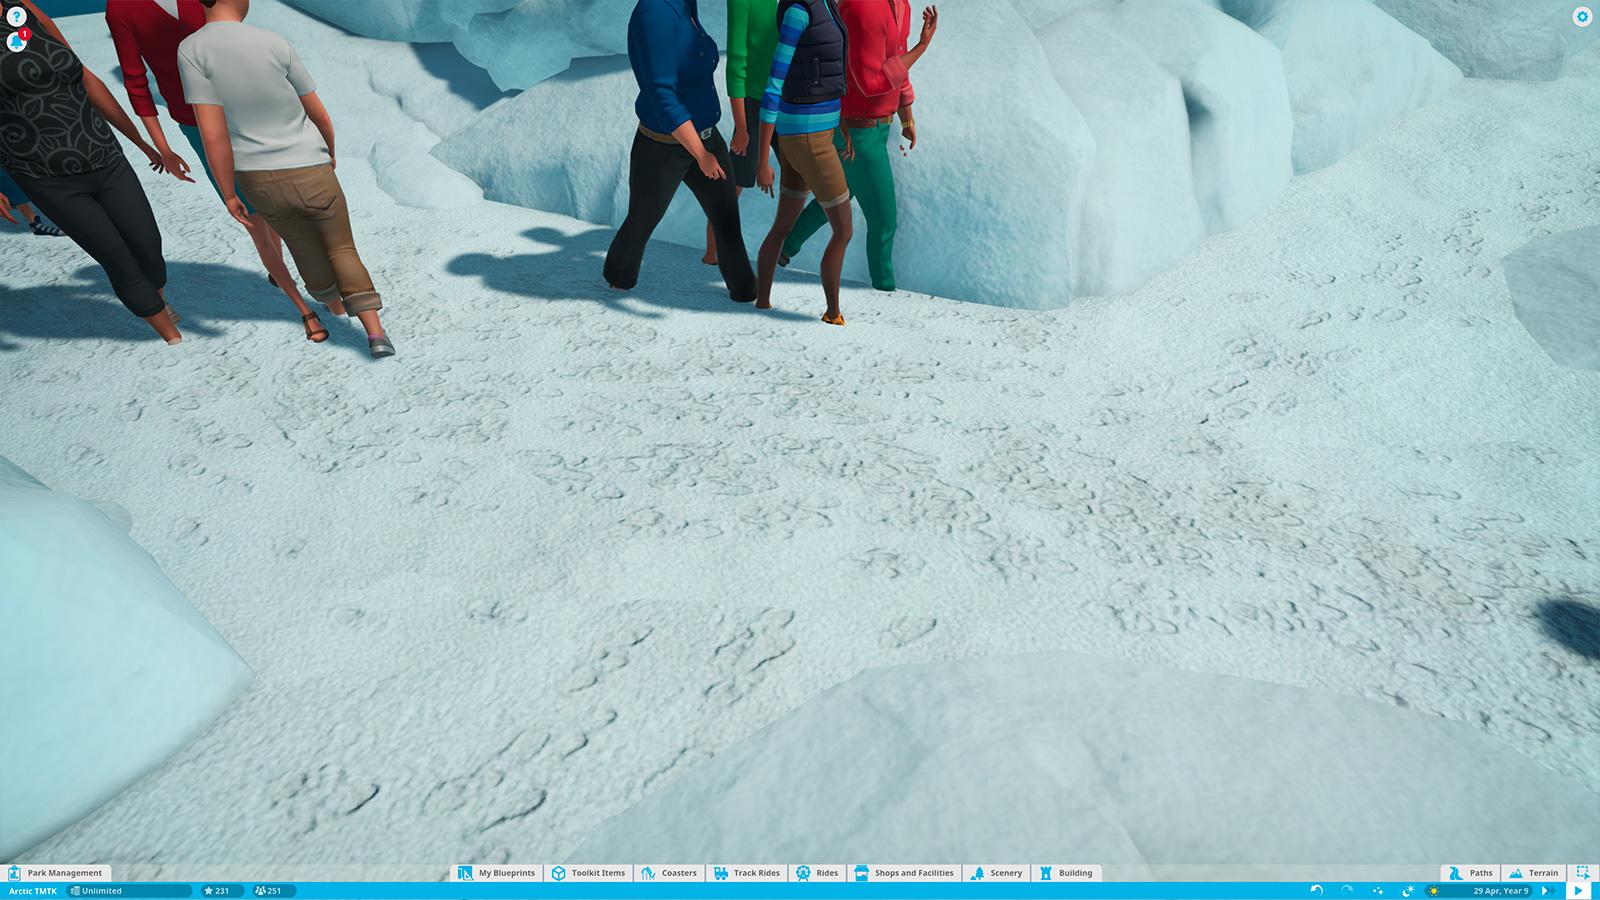 PlanCo-QVP-Screenshots-BatchA-0141.jpg